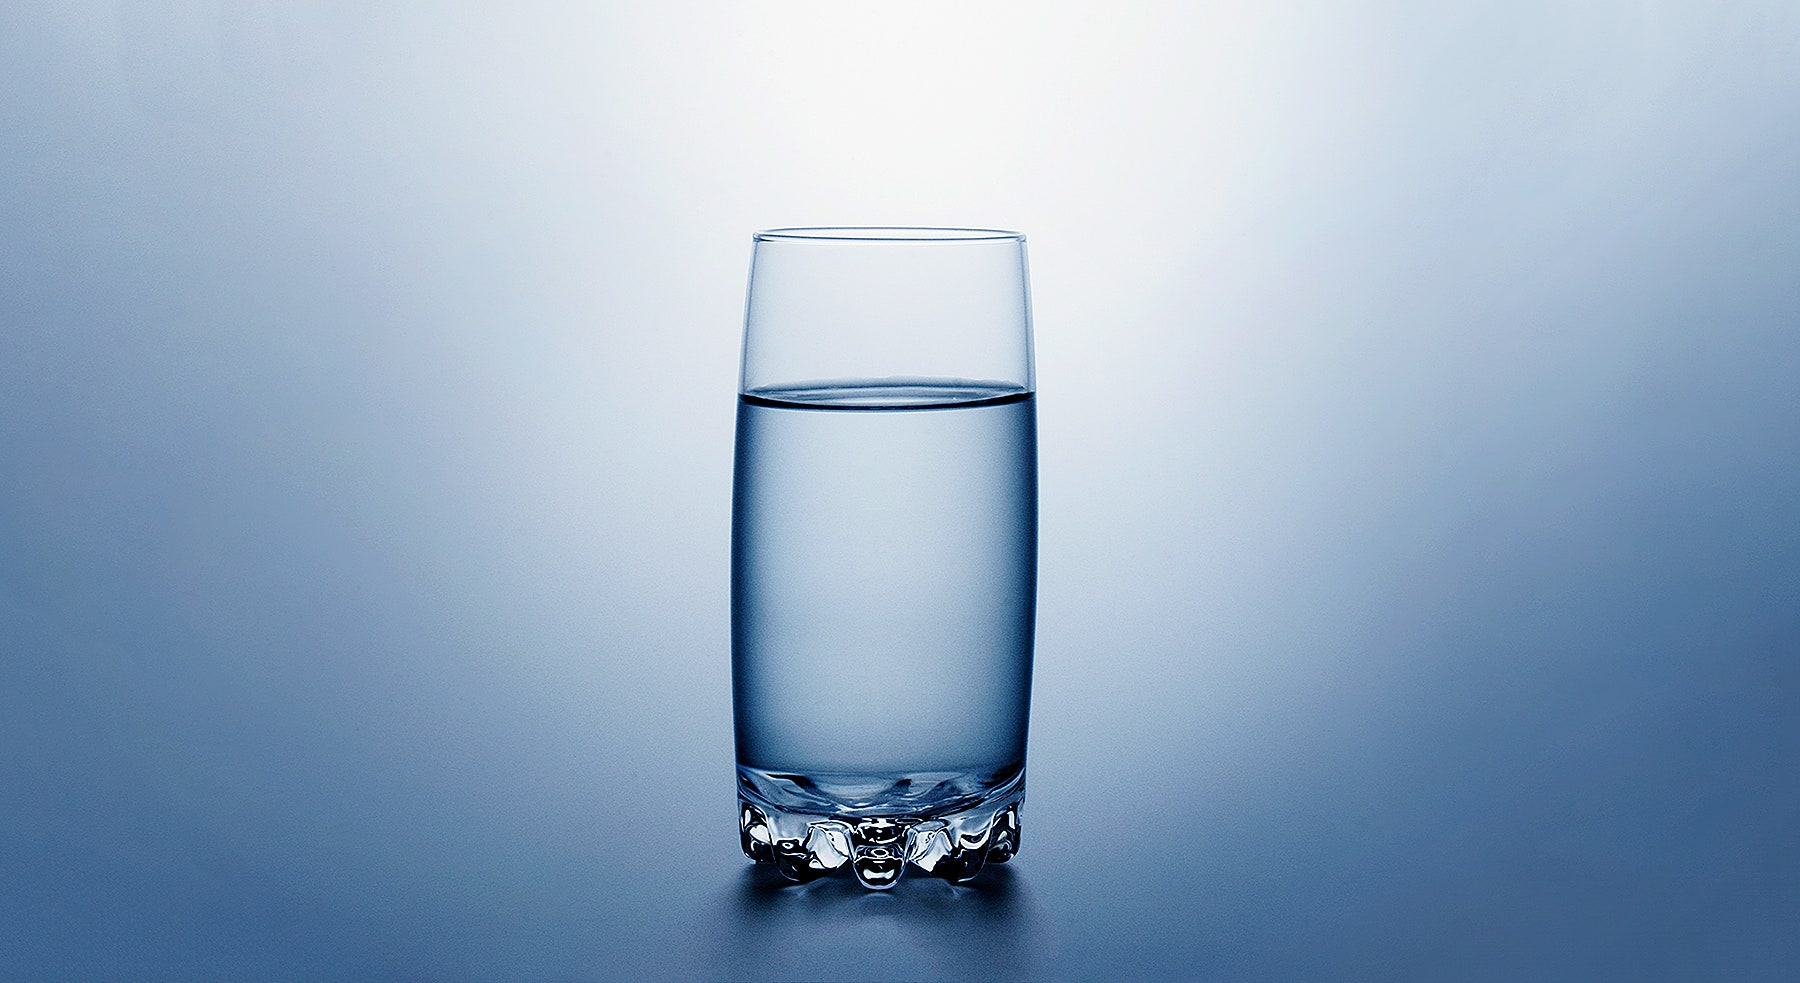 Investera i vatten precis som Michael Burry